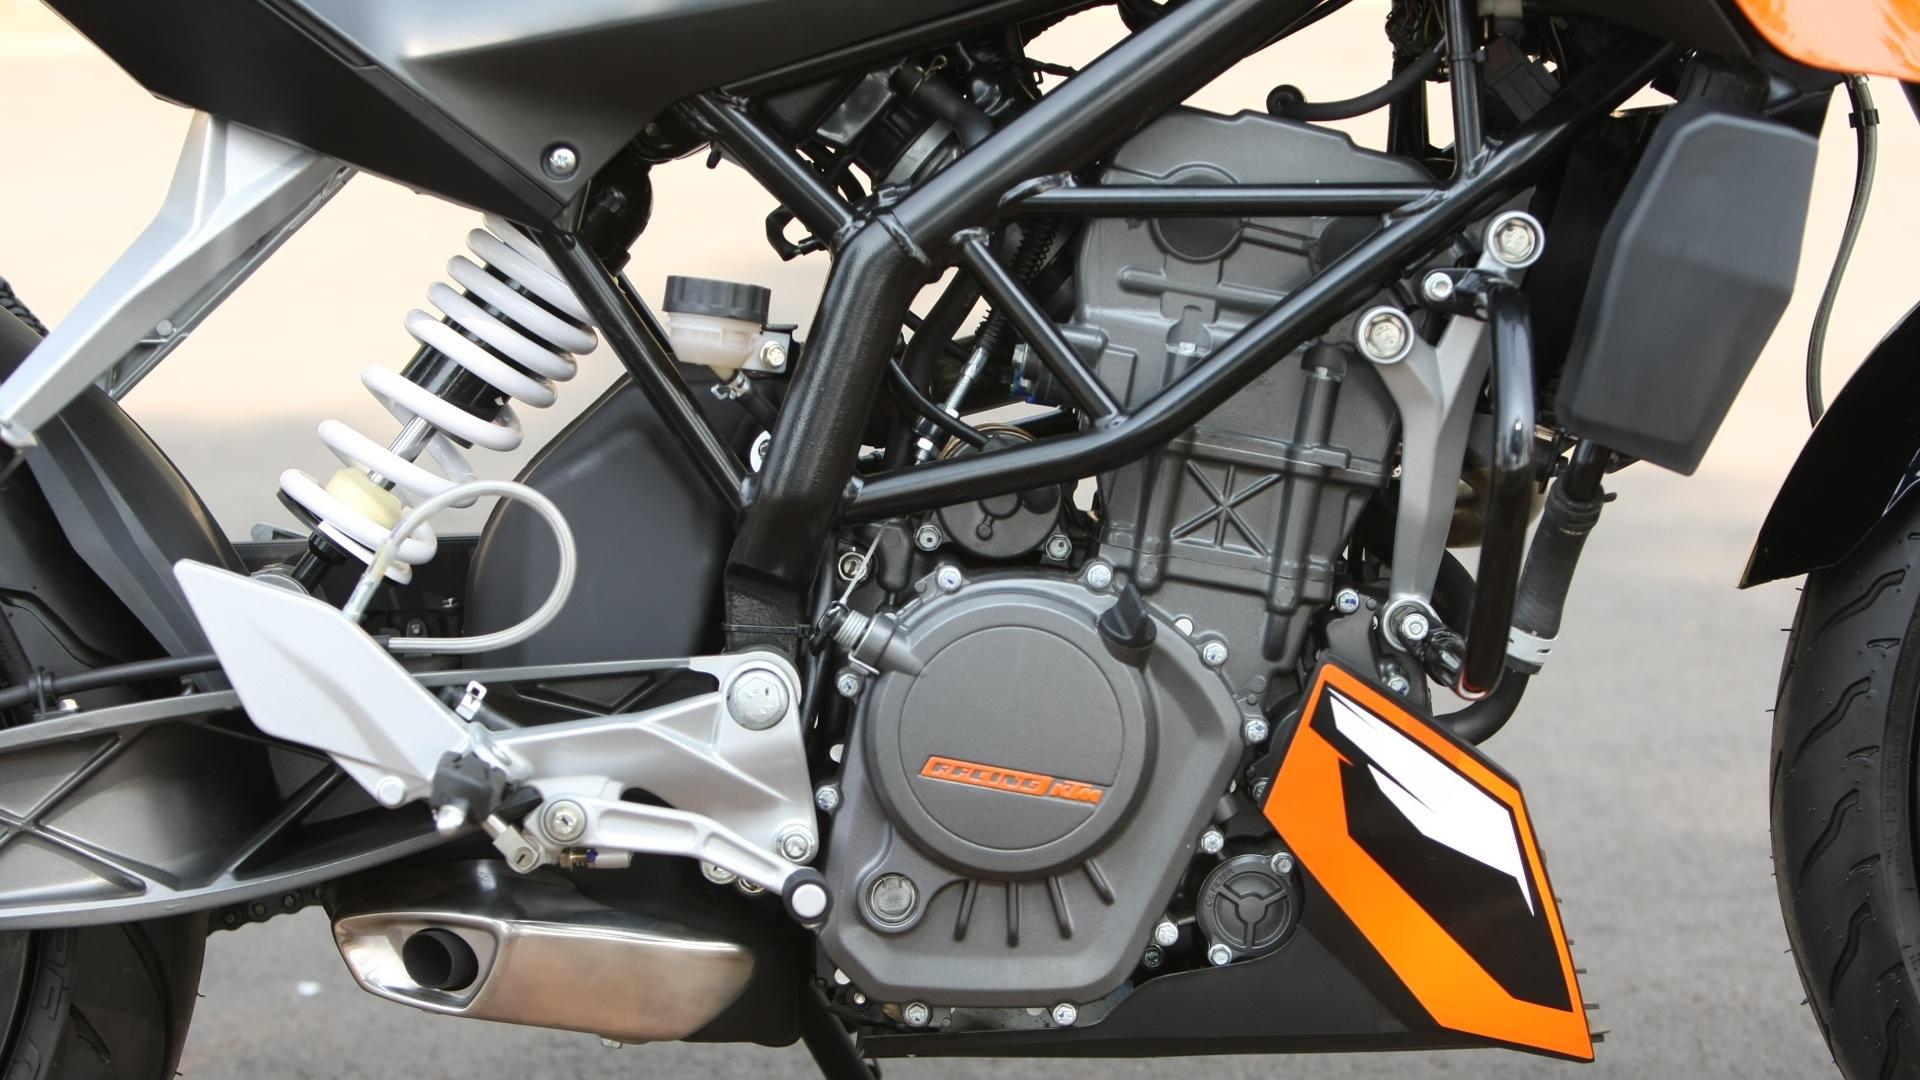 KTM 200 Duke 2013 STD Exterior